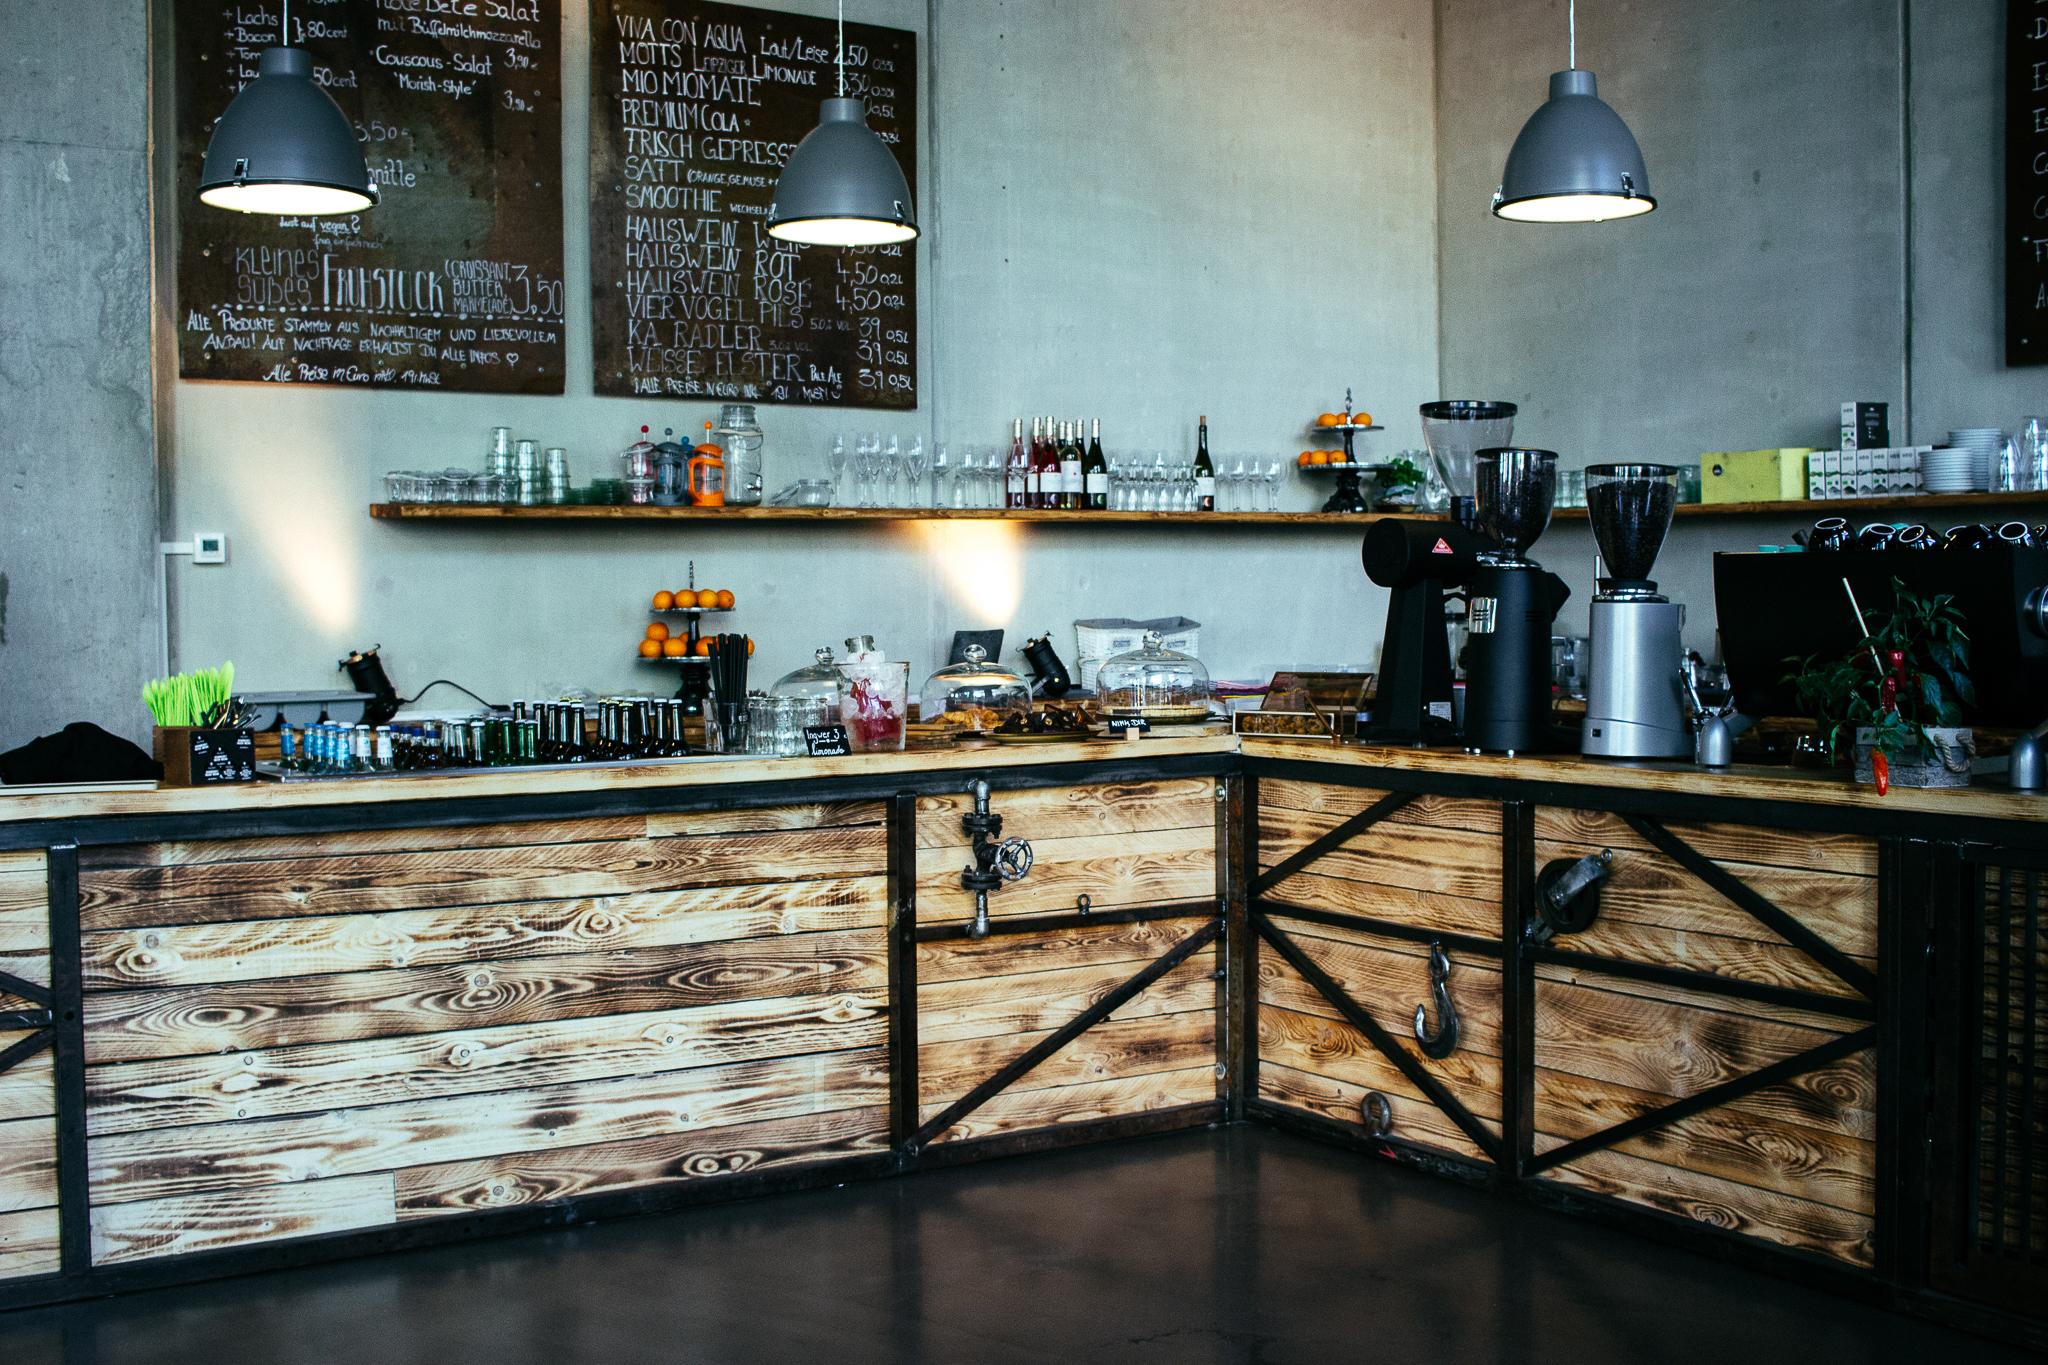 _MG_4523franz morish_kaffeehaus